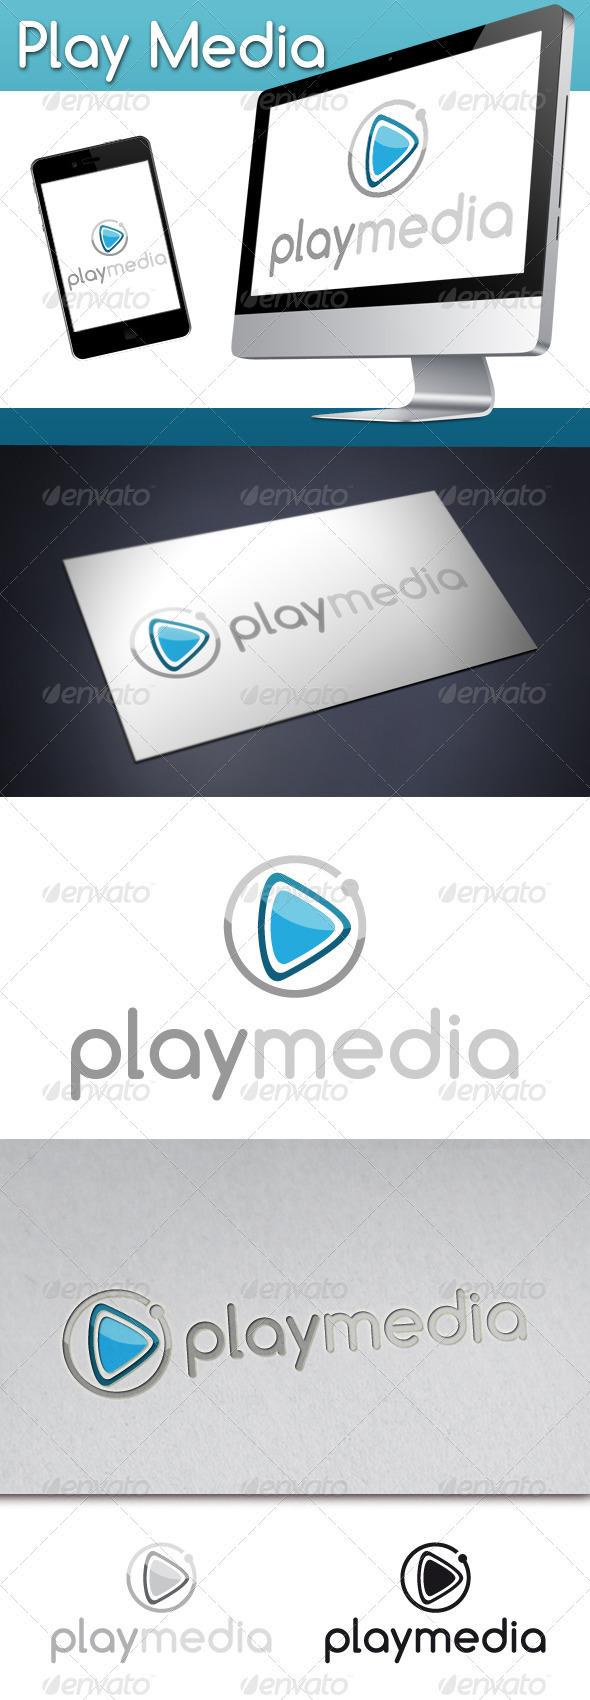 Play Media Logo 1